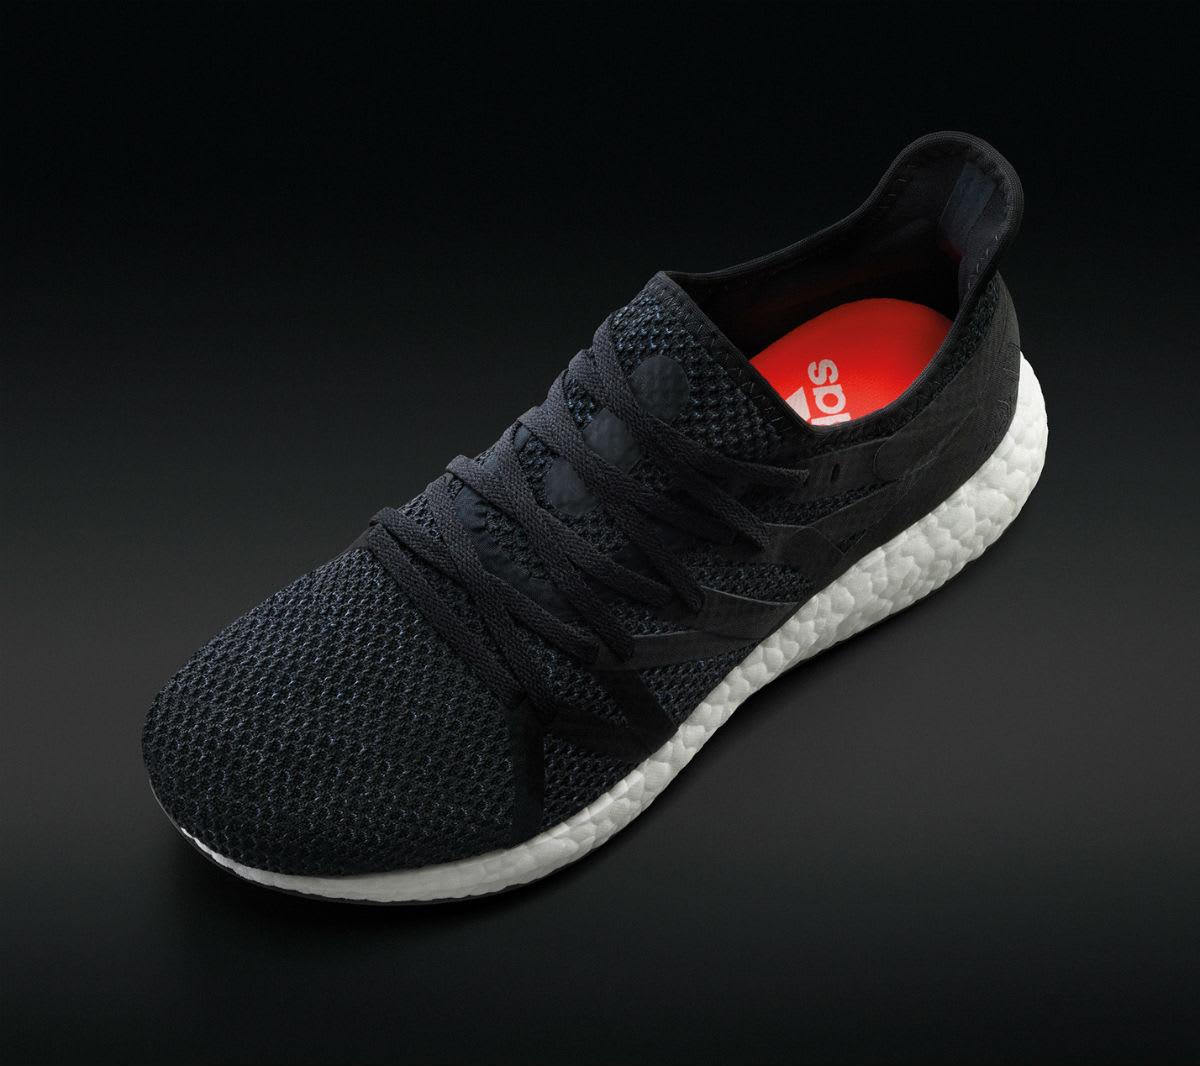 Adidas Speedfactory AM4NYC Release Date Top